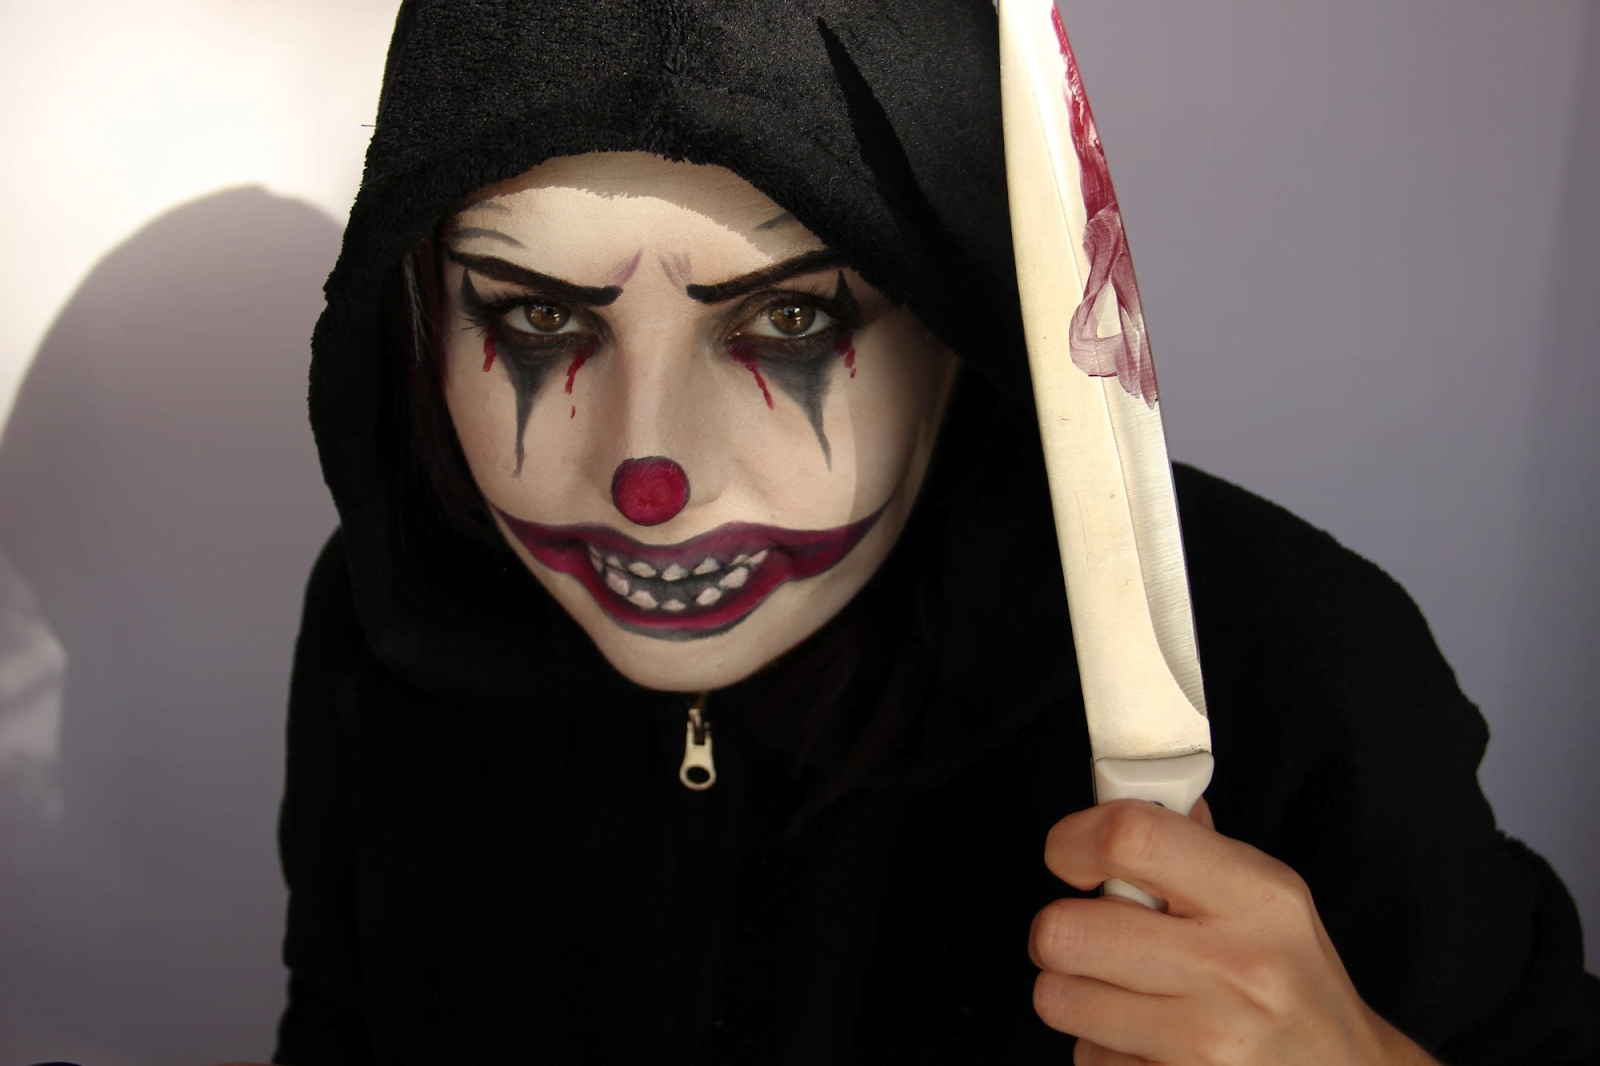 Образ Джефф убийца на хеллоуин